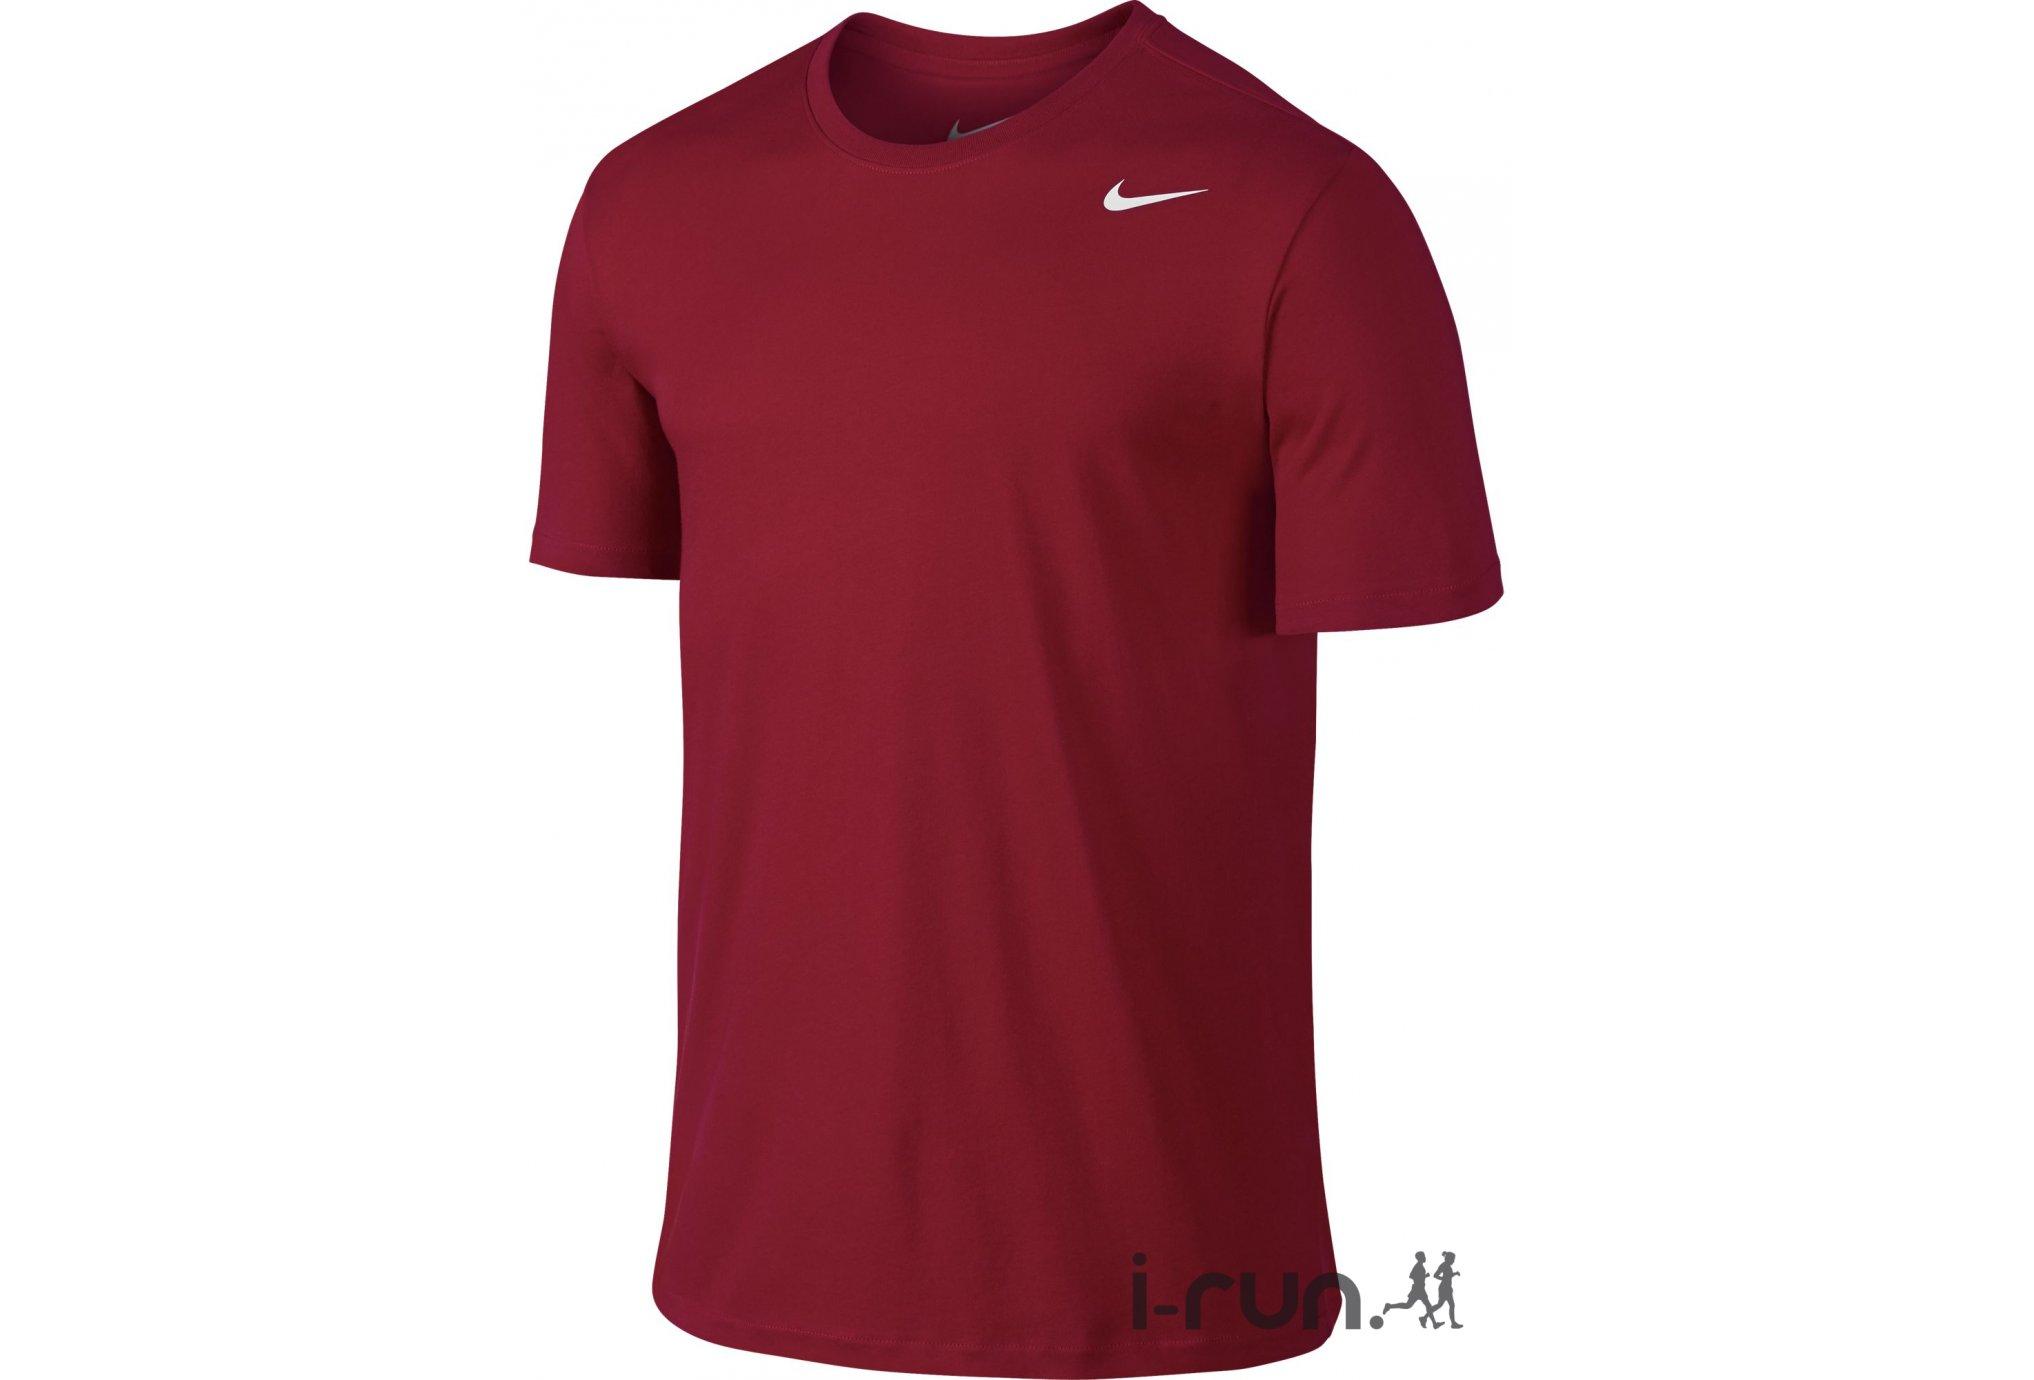 Nike Tee-Shirt Dri-Fit Cotton Version 2.0 M v�tement running homme